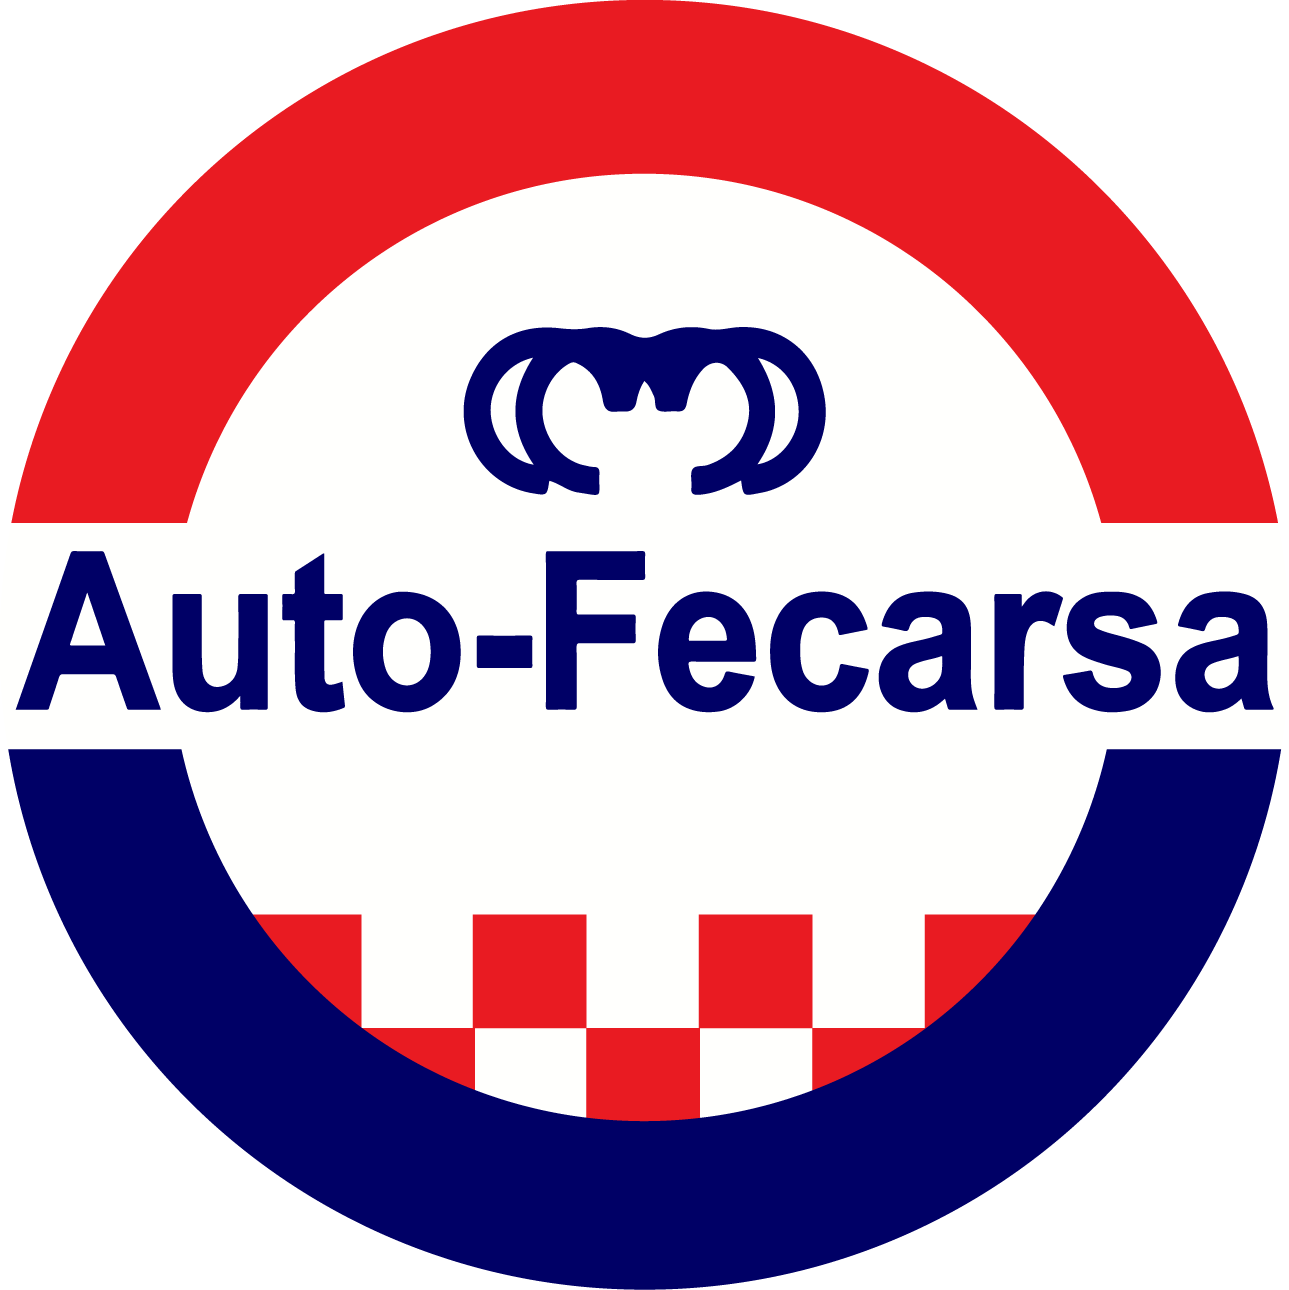 autofecarsa.png